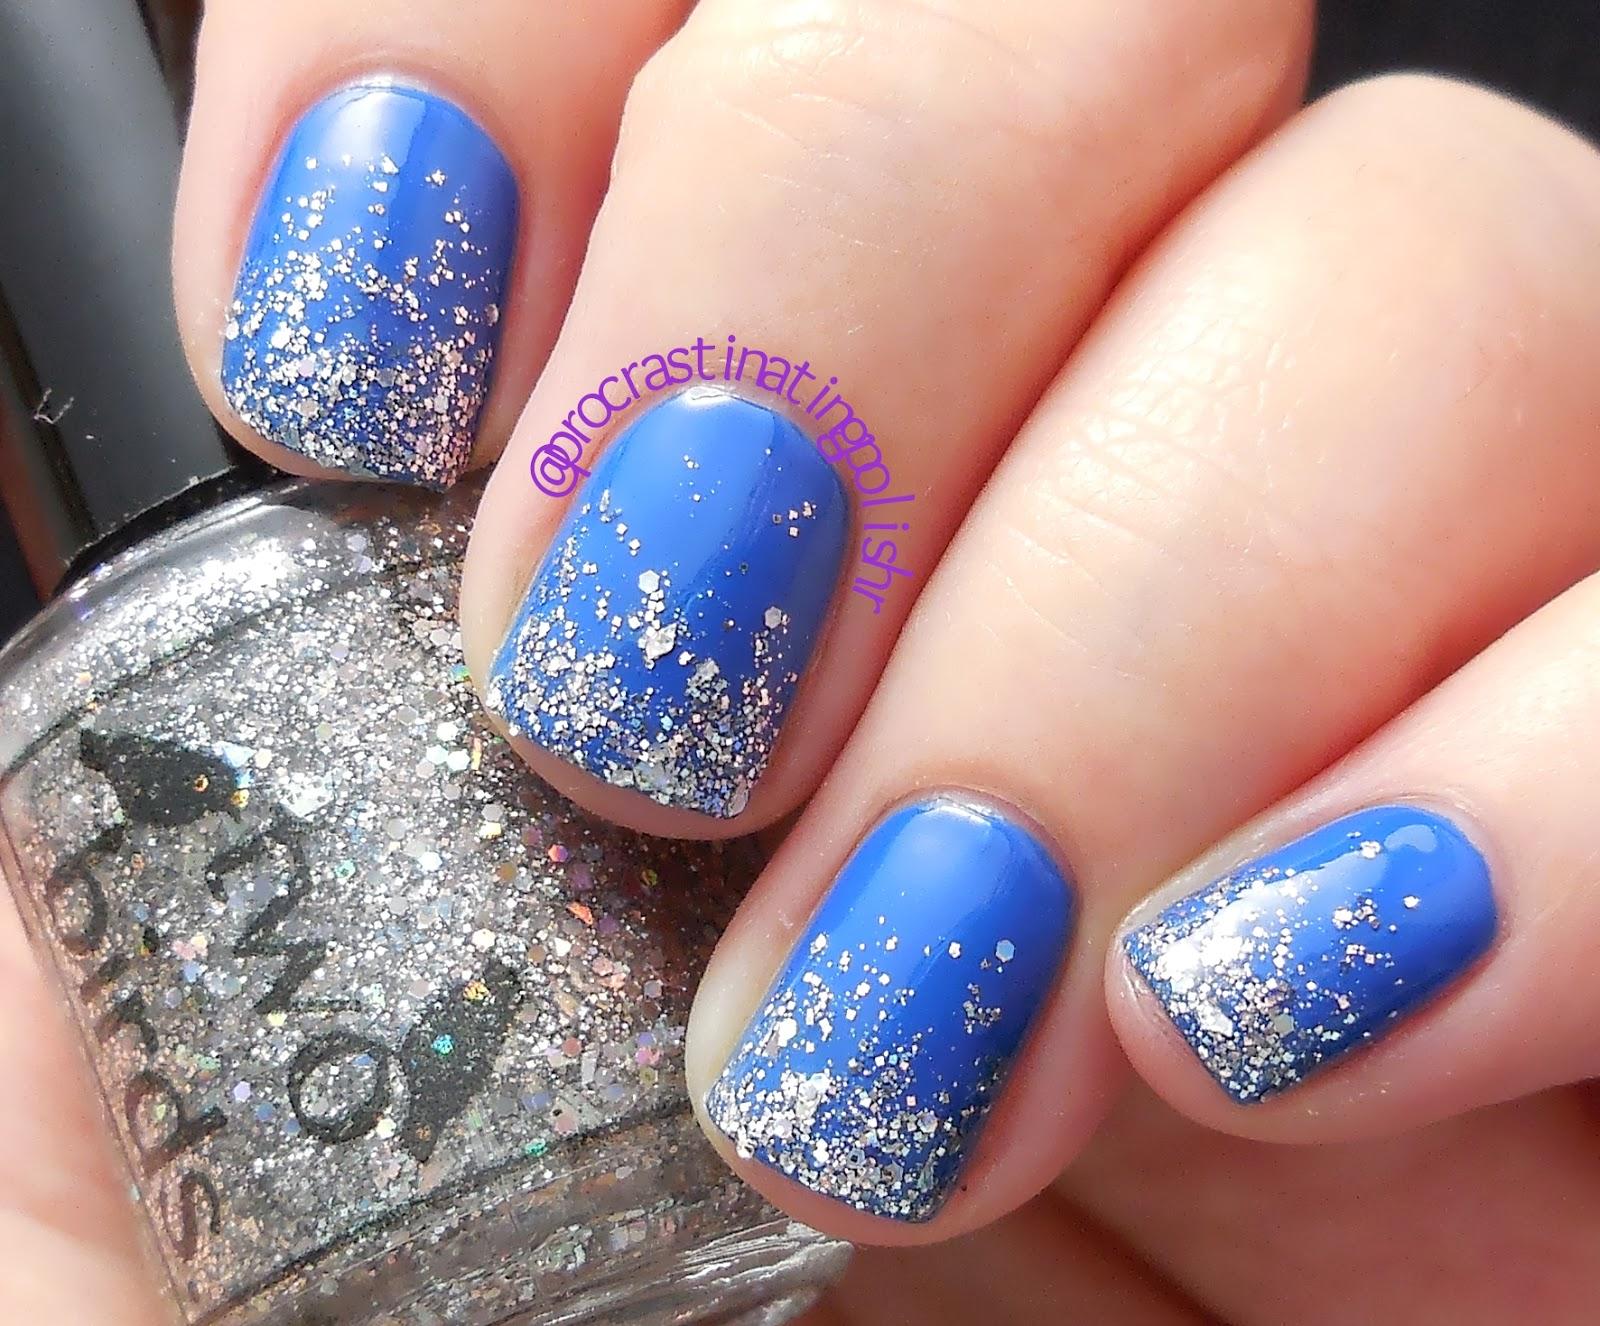 Celestial Cosmetics - Monocerous + Two Birds Lacquer - silver glitter